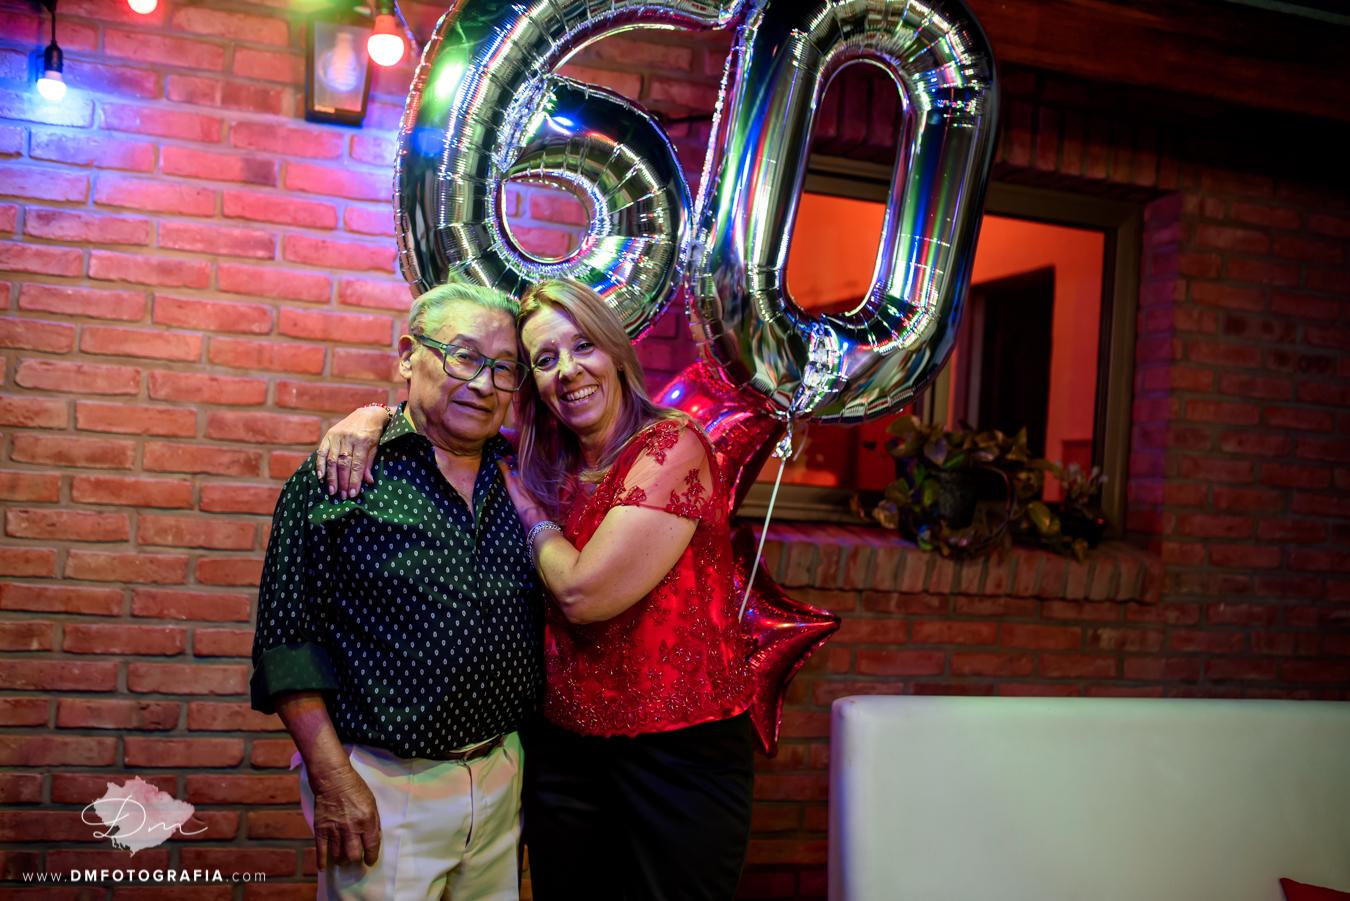 Fotógrafa de eventos en Victoria, Buenos Aires